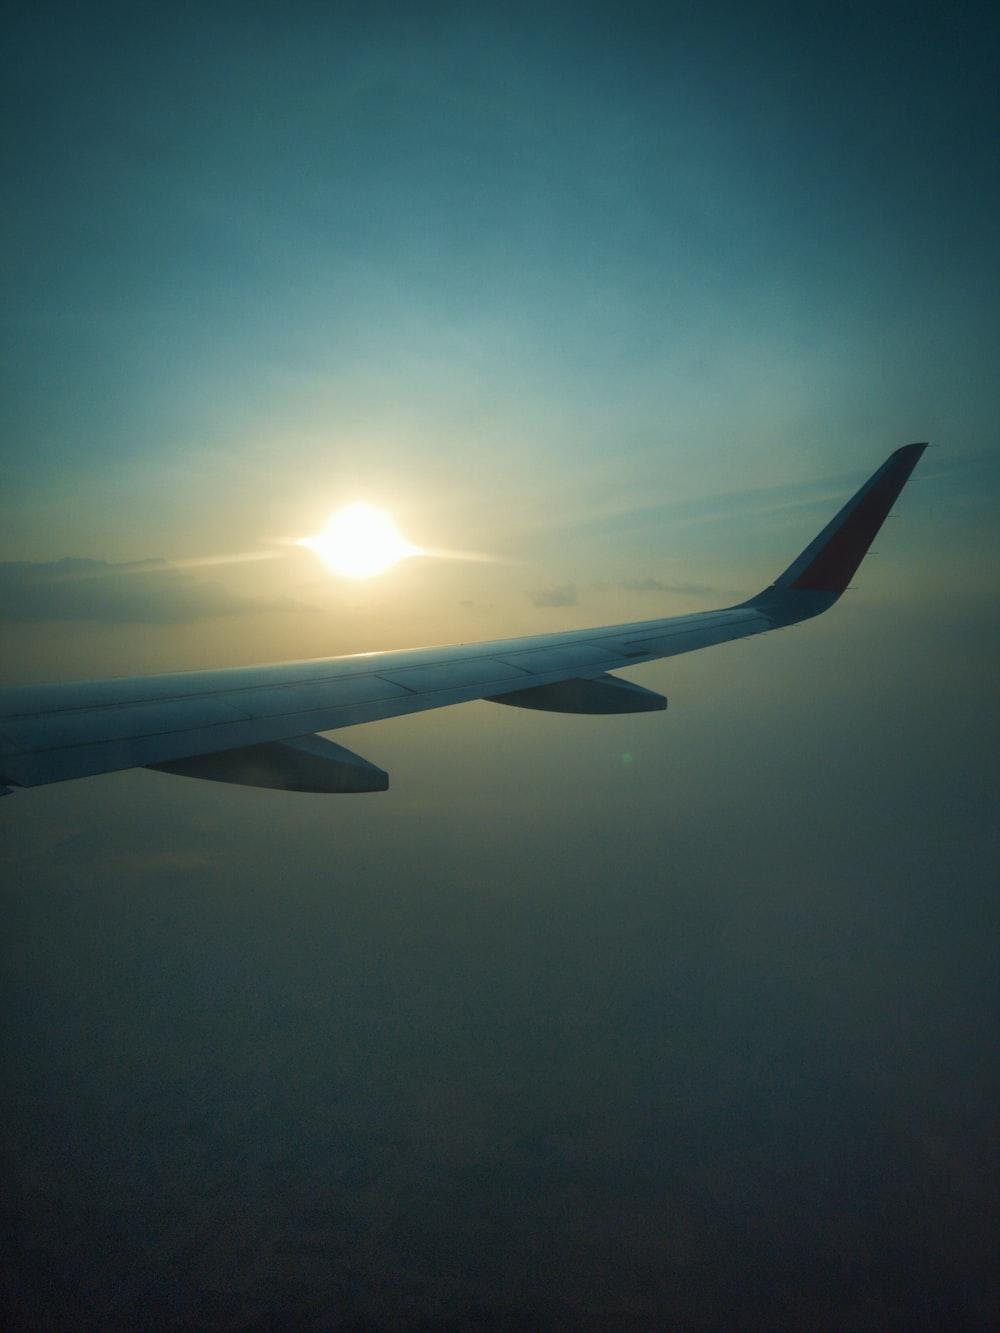 airplane on flight